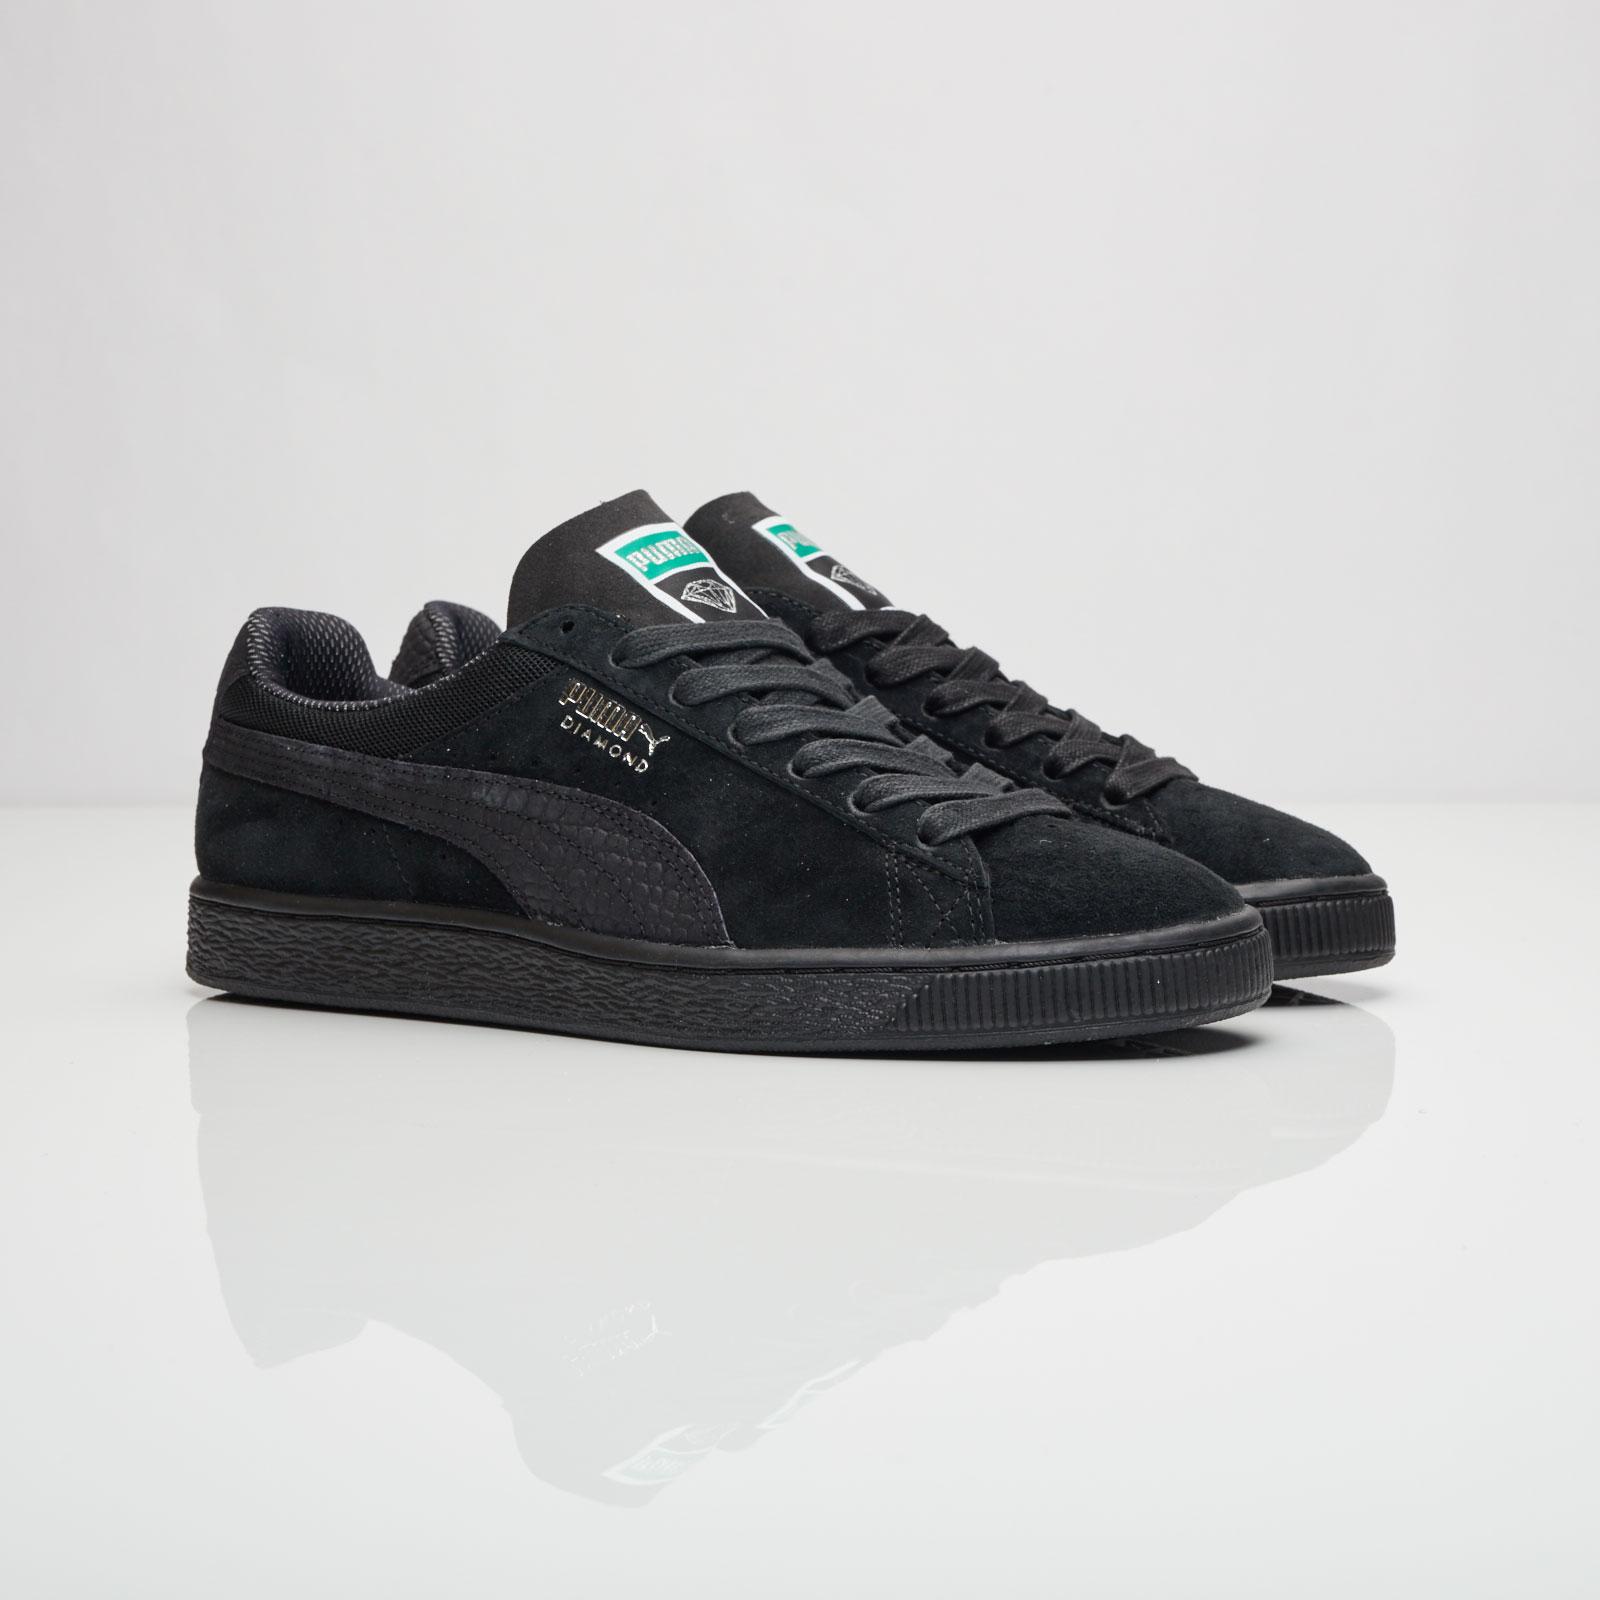 da84d9c588a600 Puma Suede X Diamond Supply - 363001-01 - Sneakersnstuff